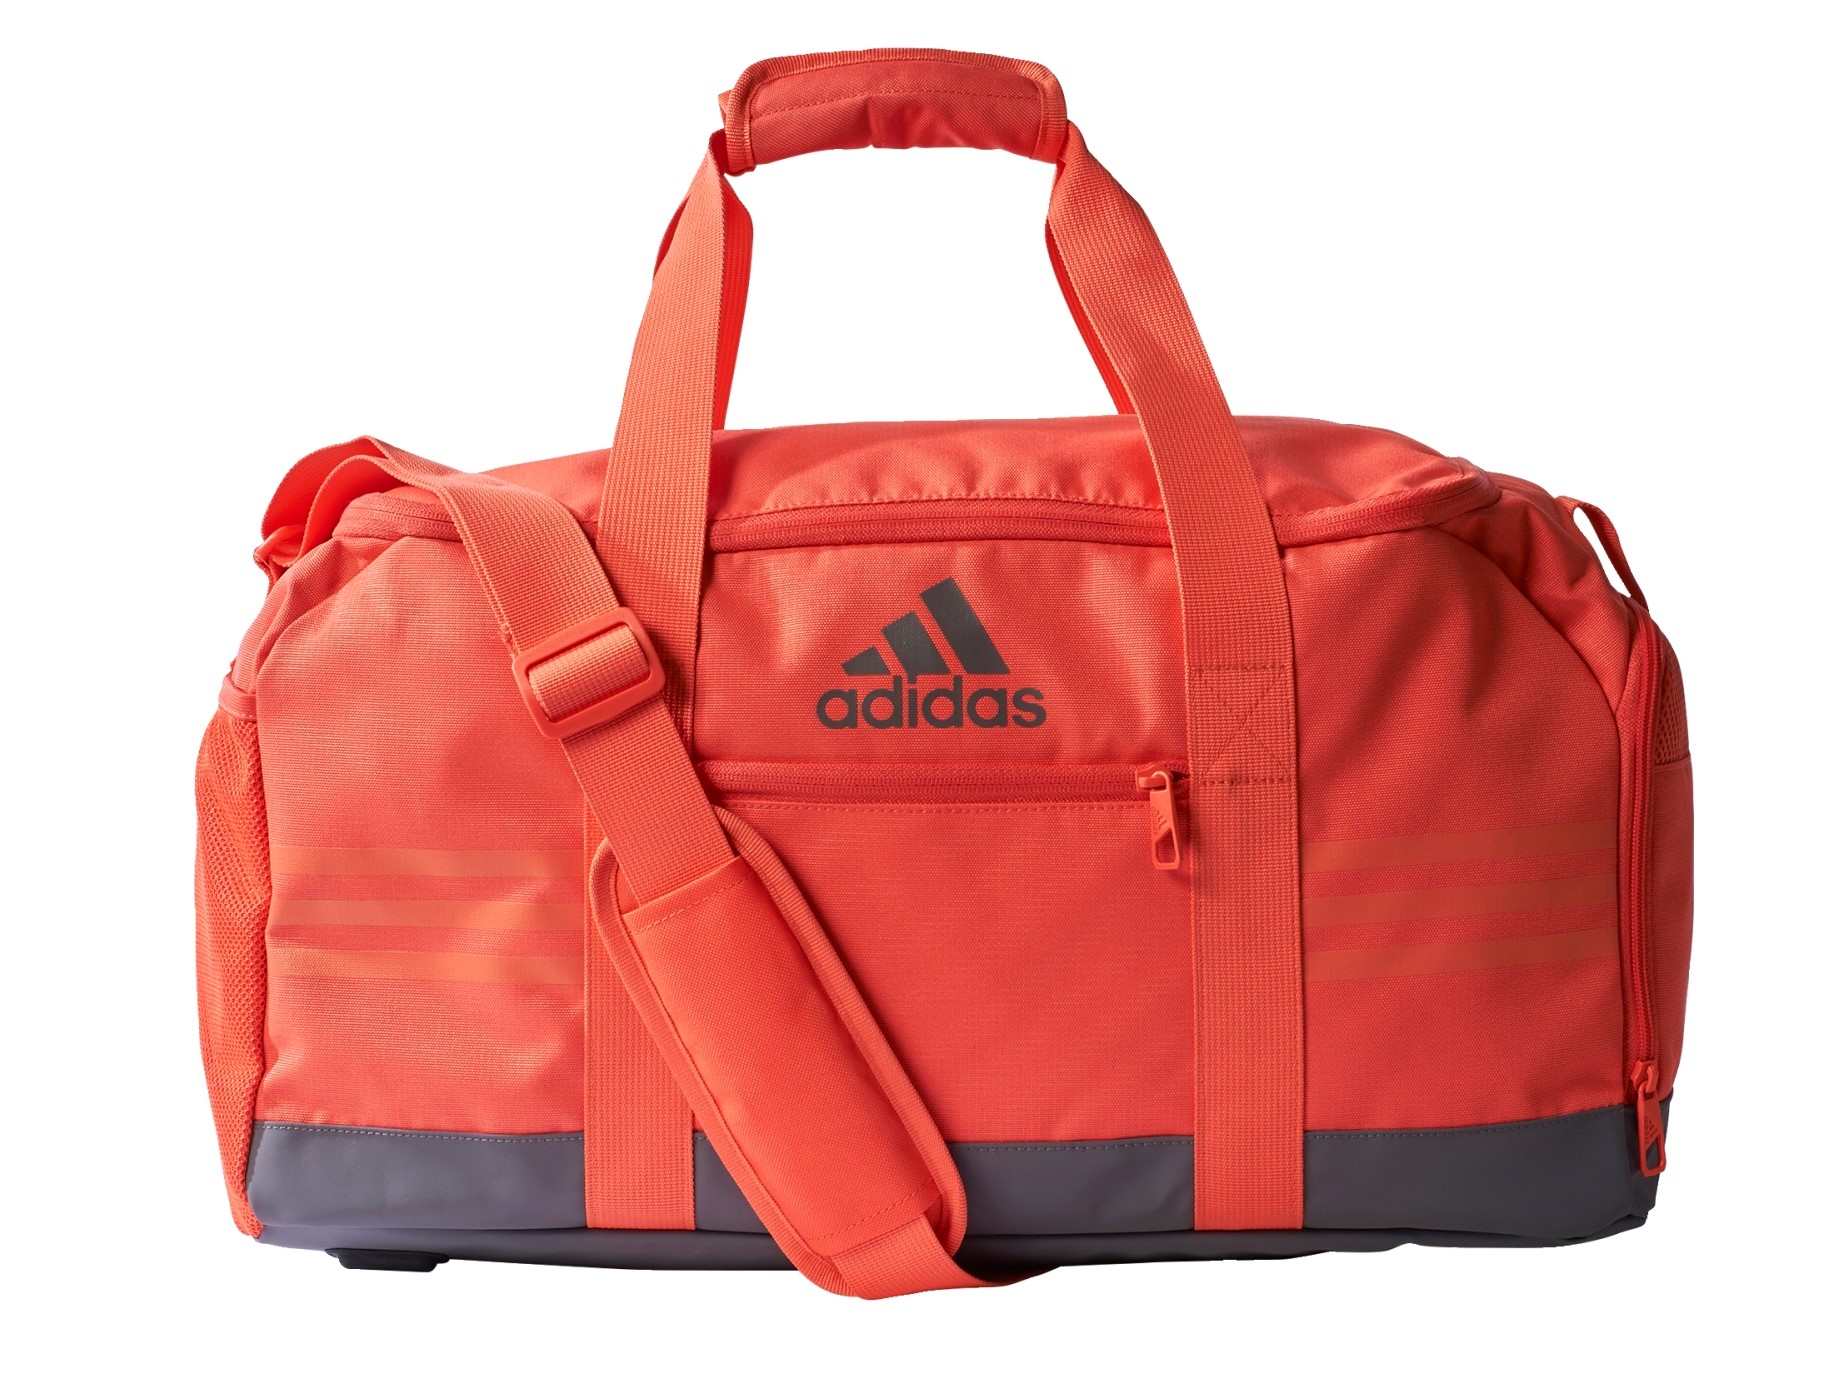 eaa7d24798 Dámska športová taška adidas 3S PER TB S červená